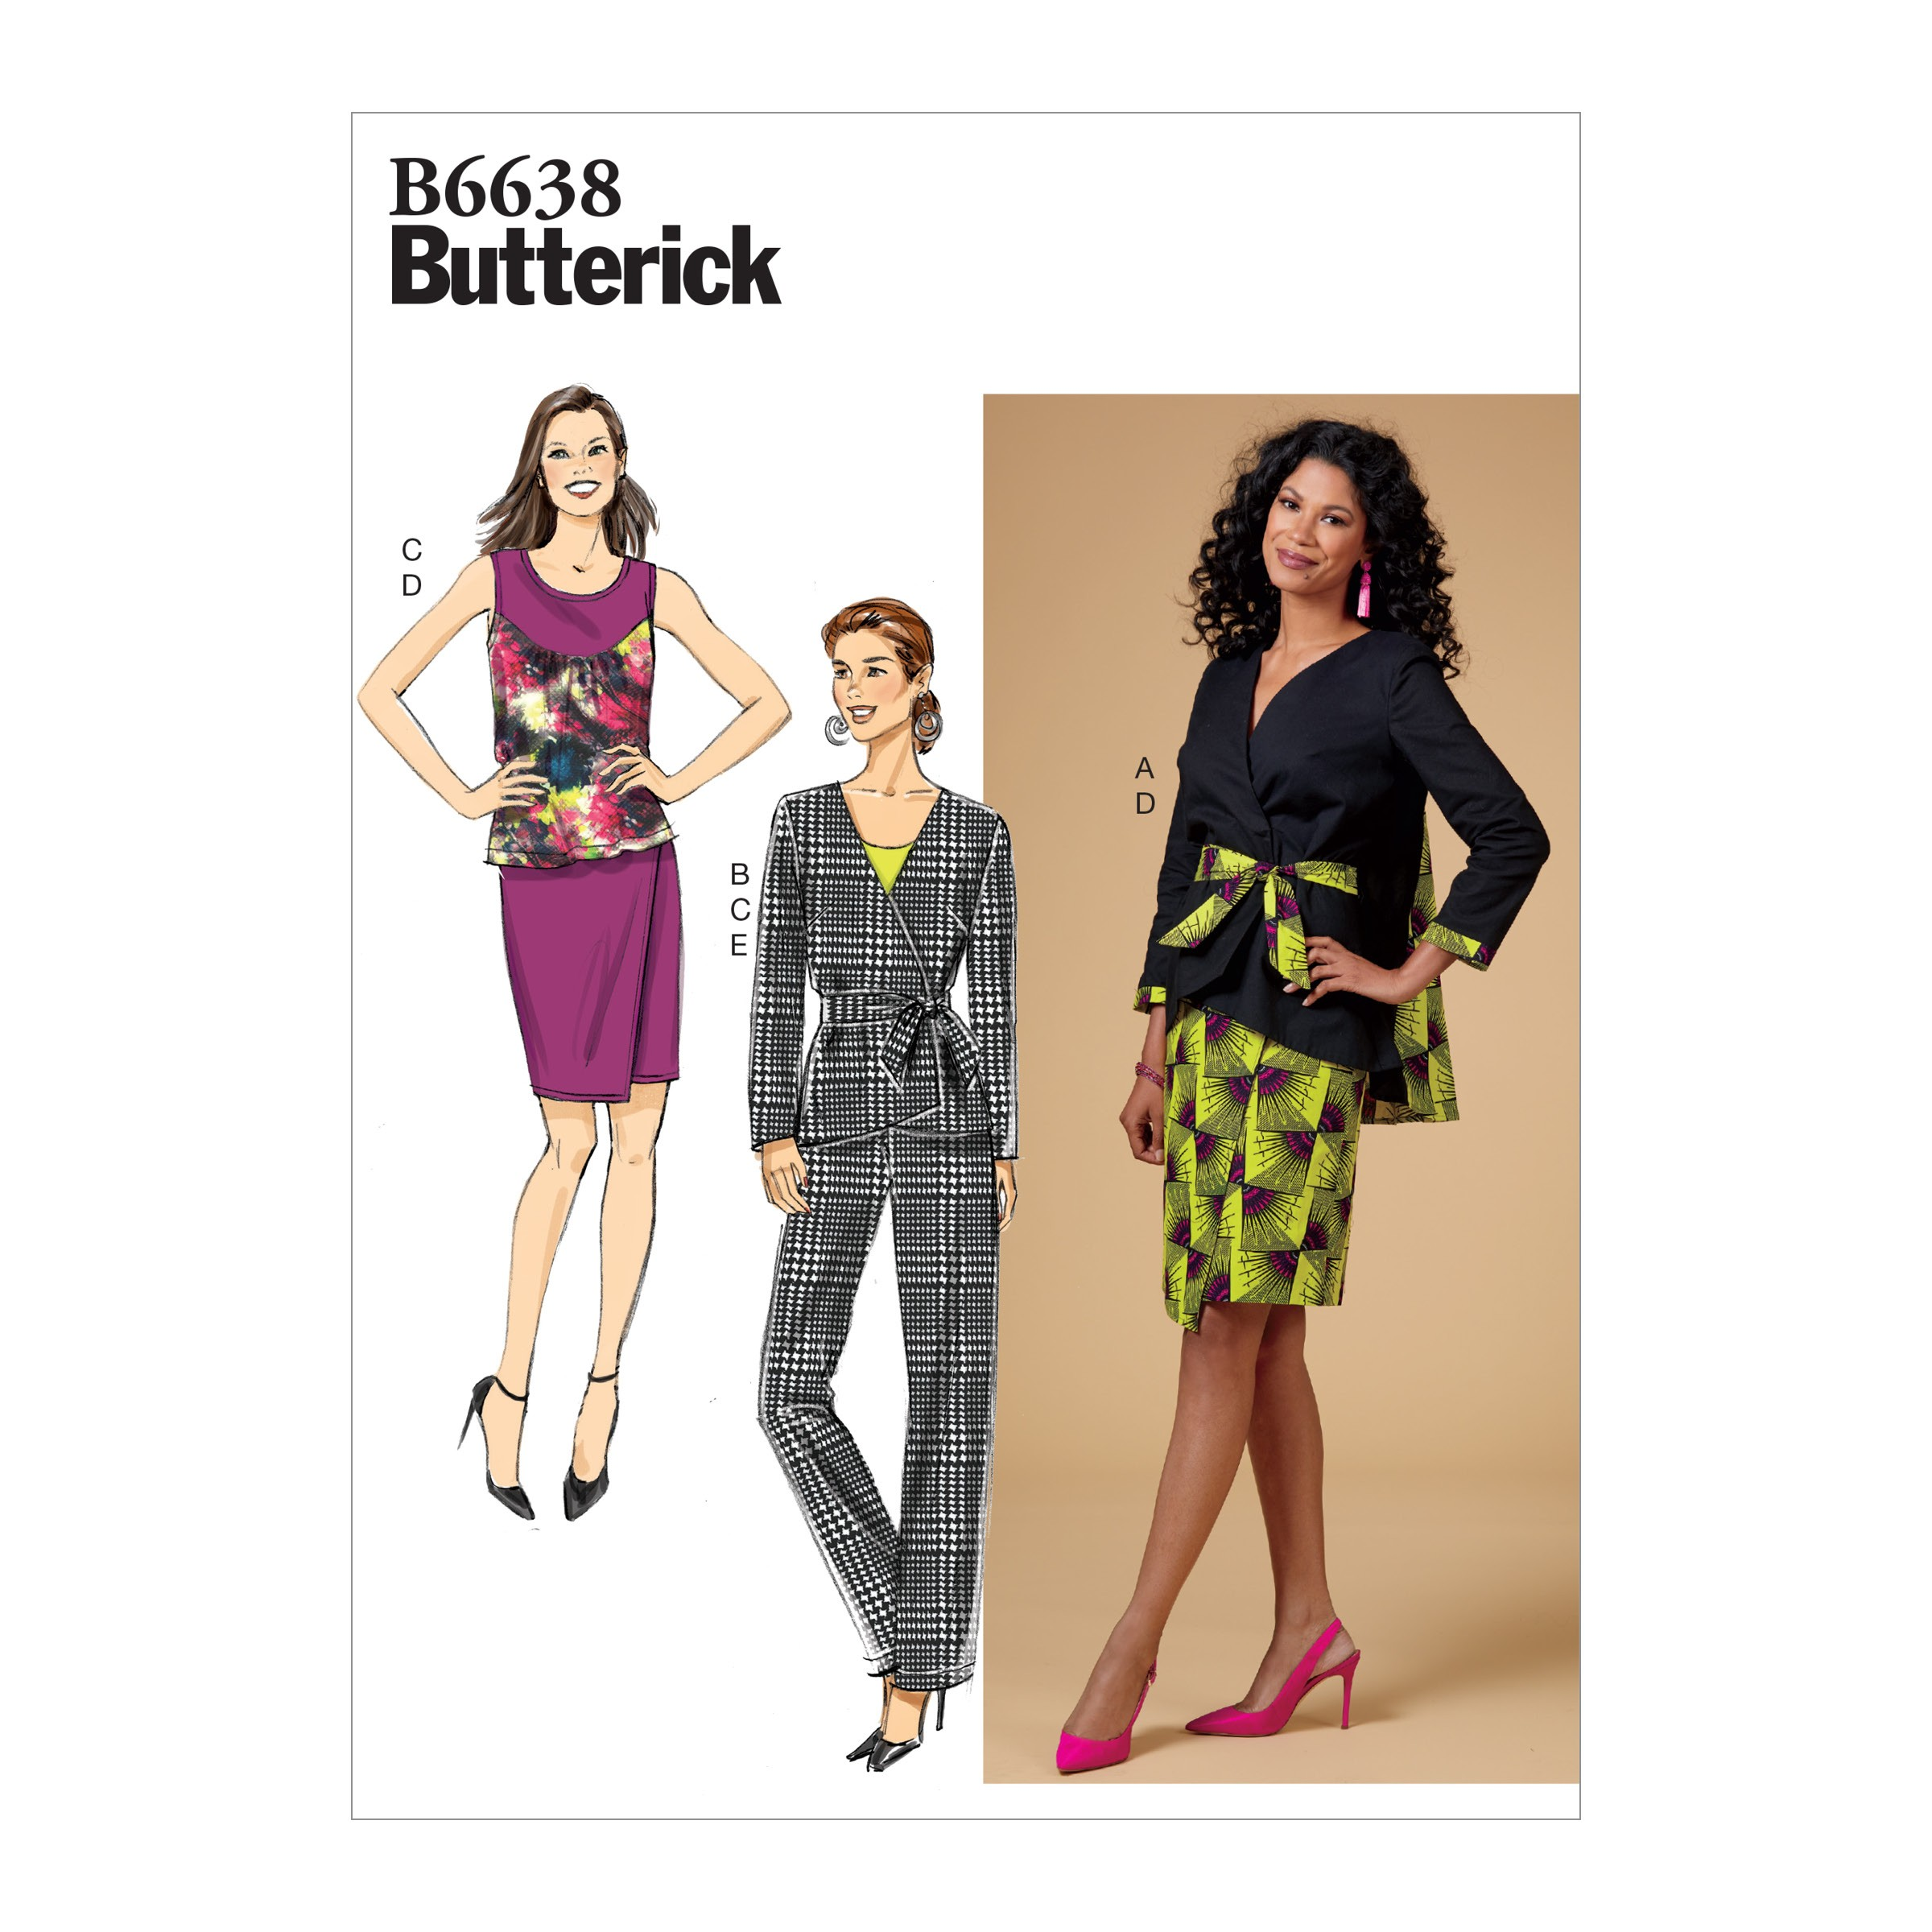 Butterick Sewing Pattern 6638 Women's Jacket Top Skirt Trousers & Sash